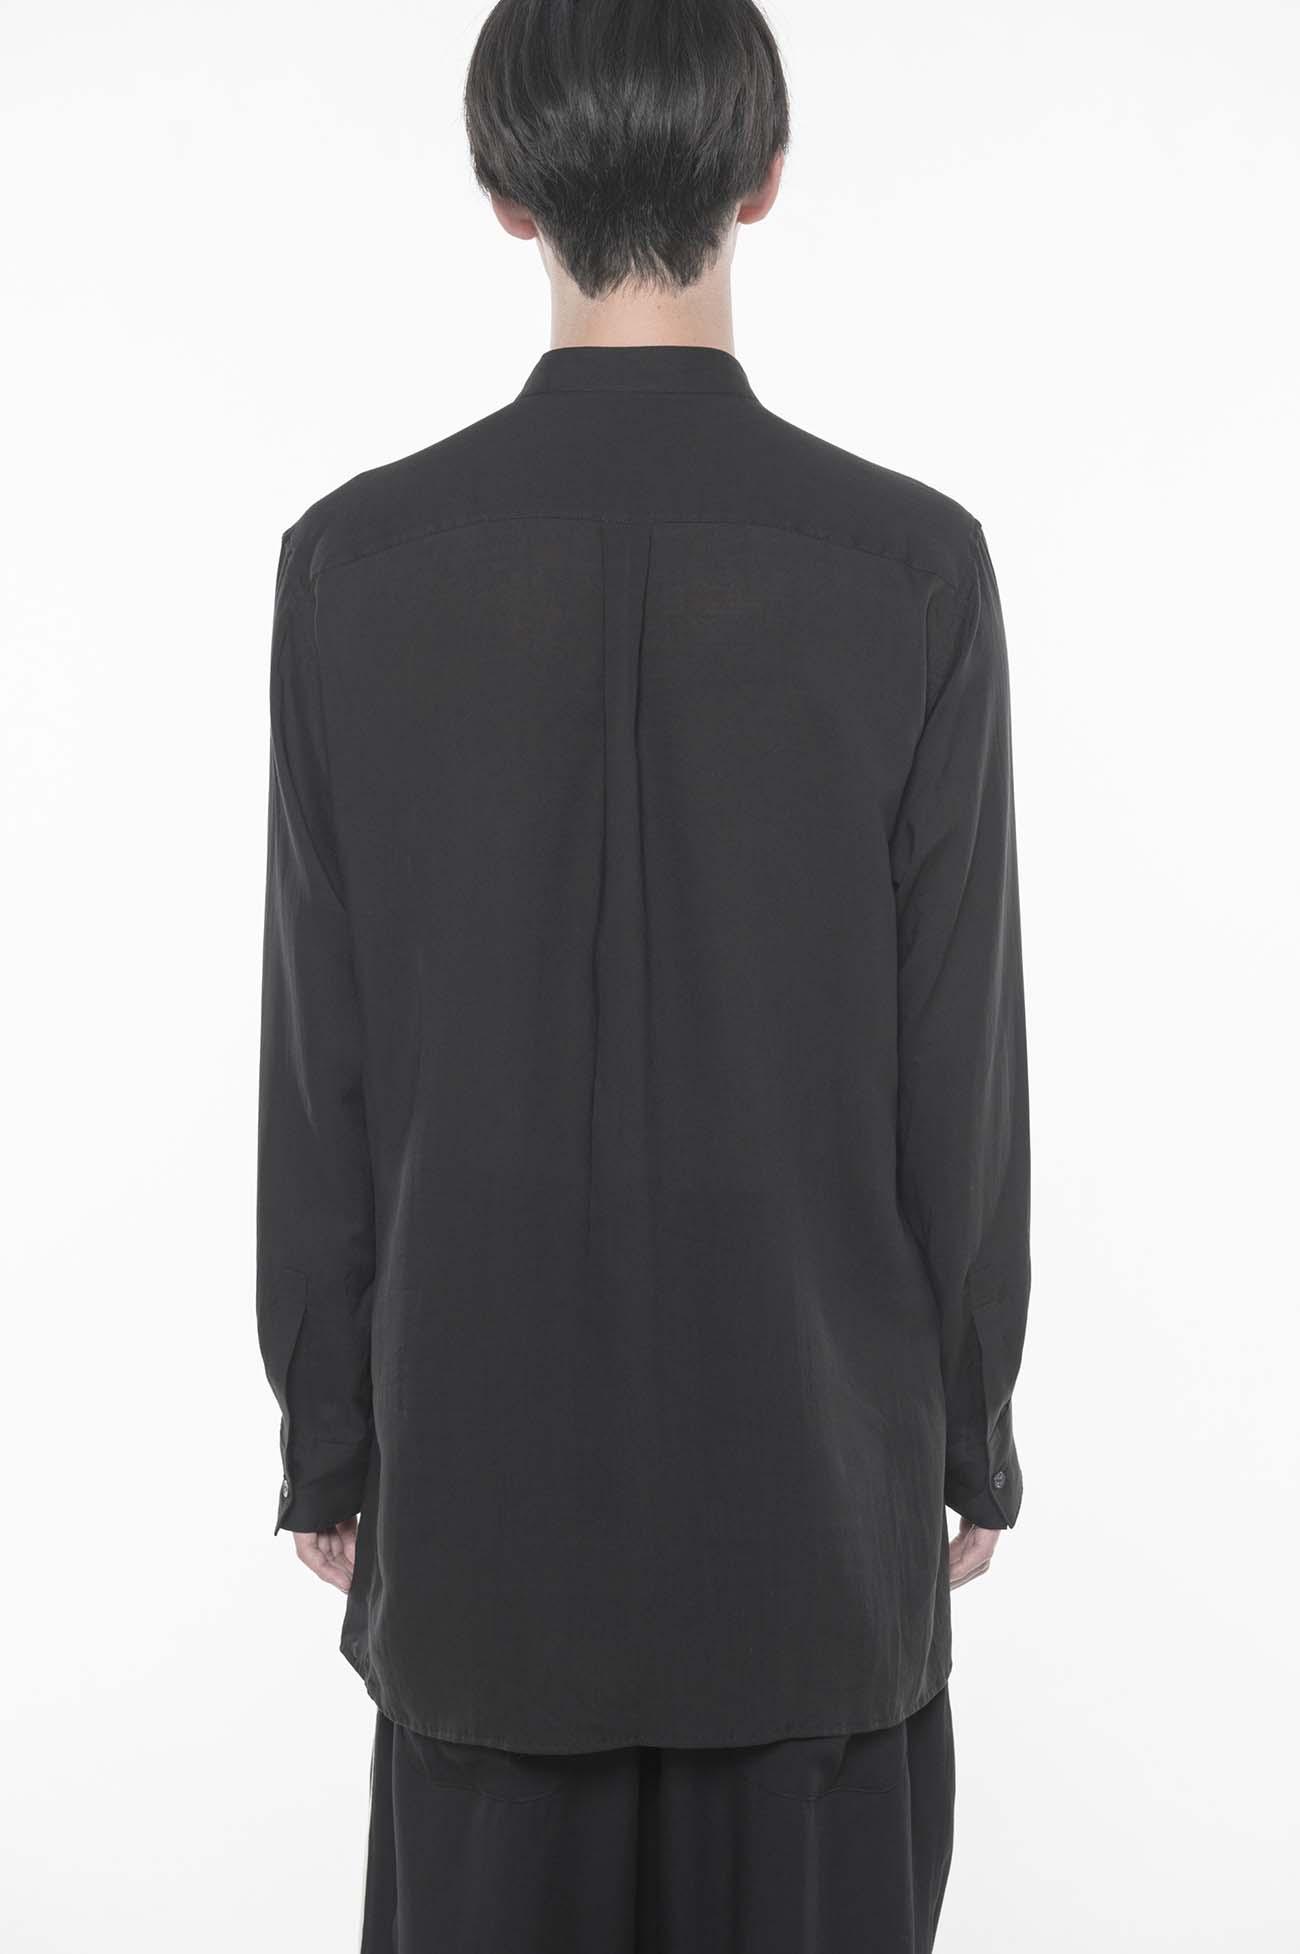 Tencel/Loan Pin Tack Shirt